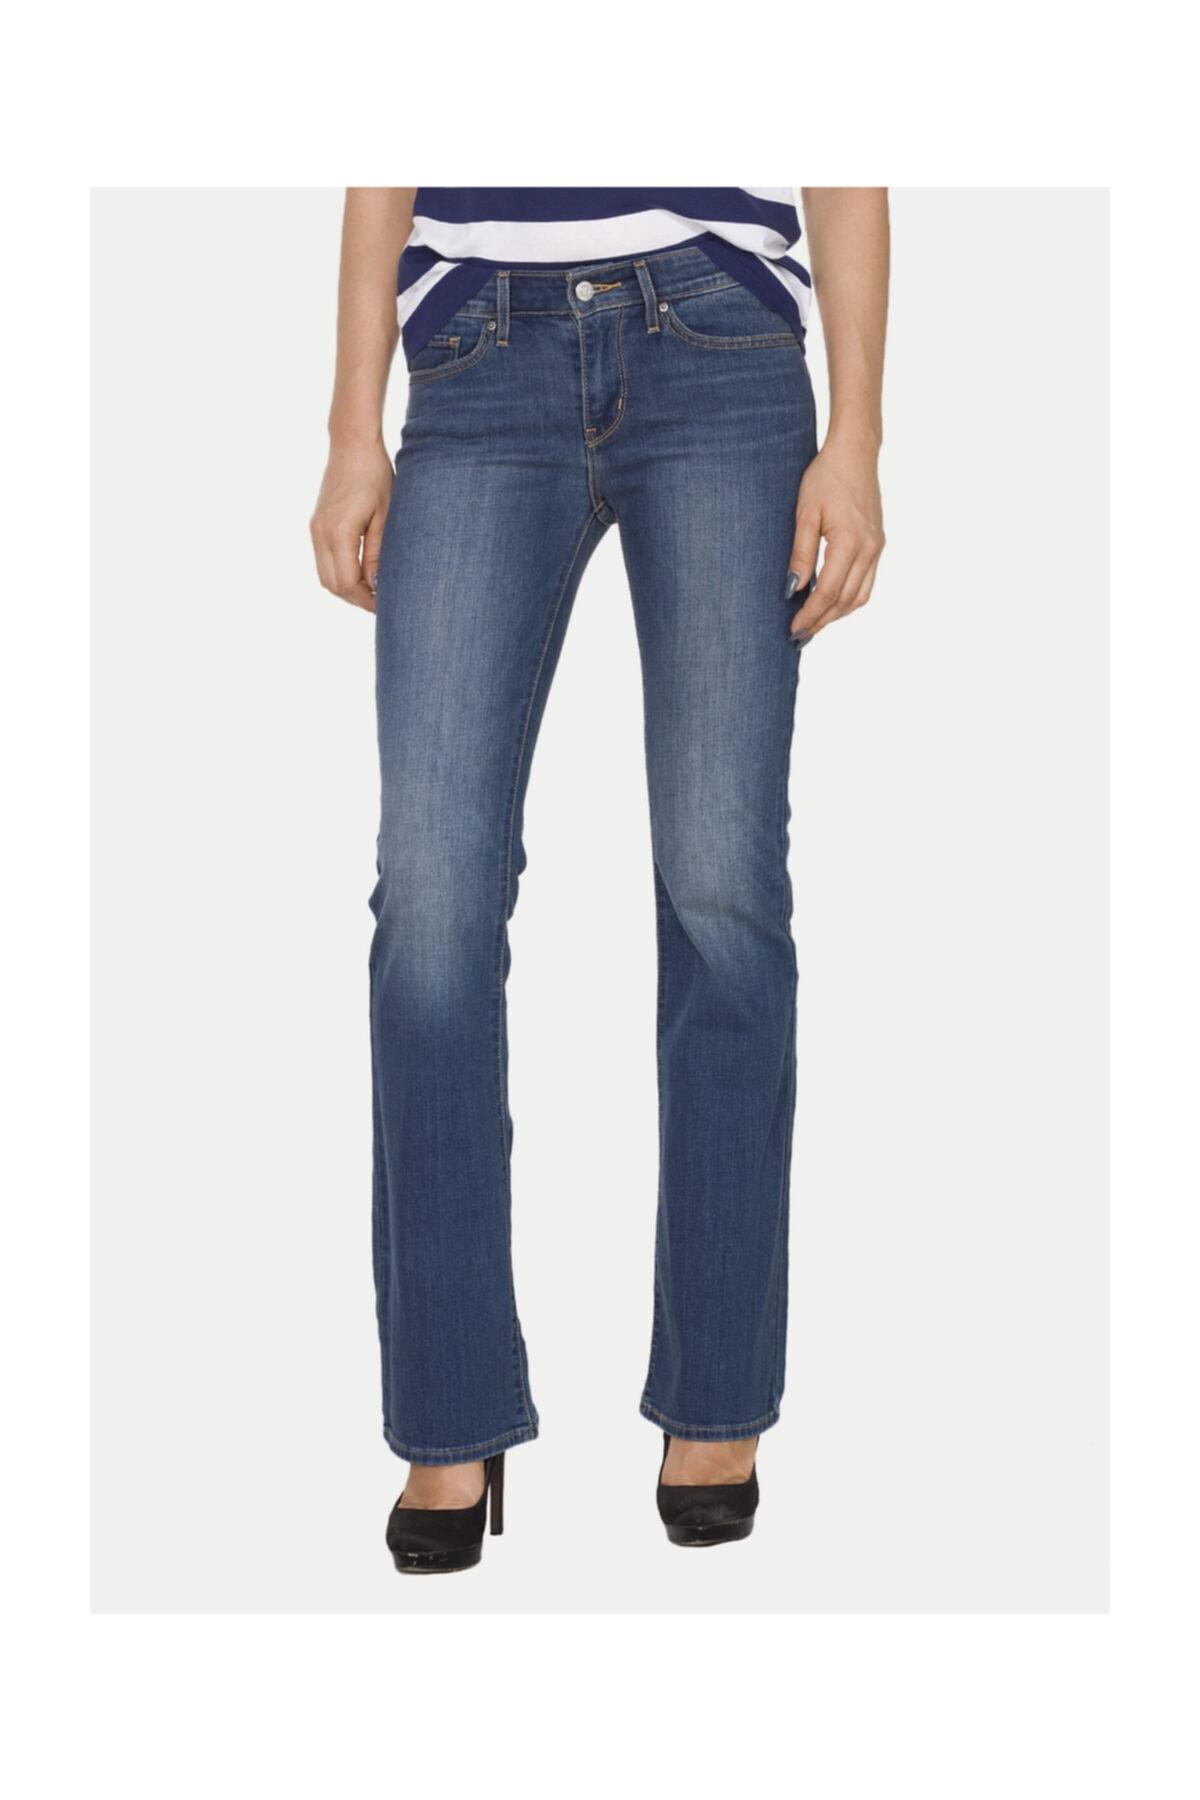 Levi's Jeans 715 Bootcut 1